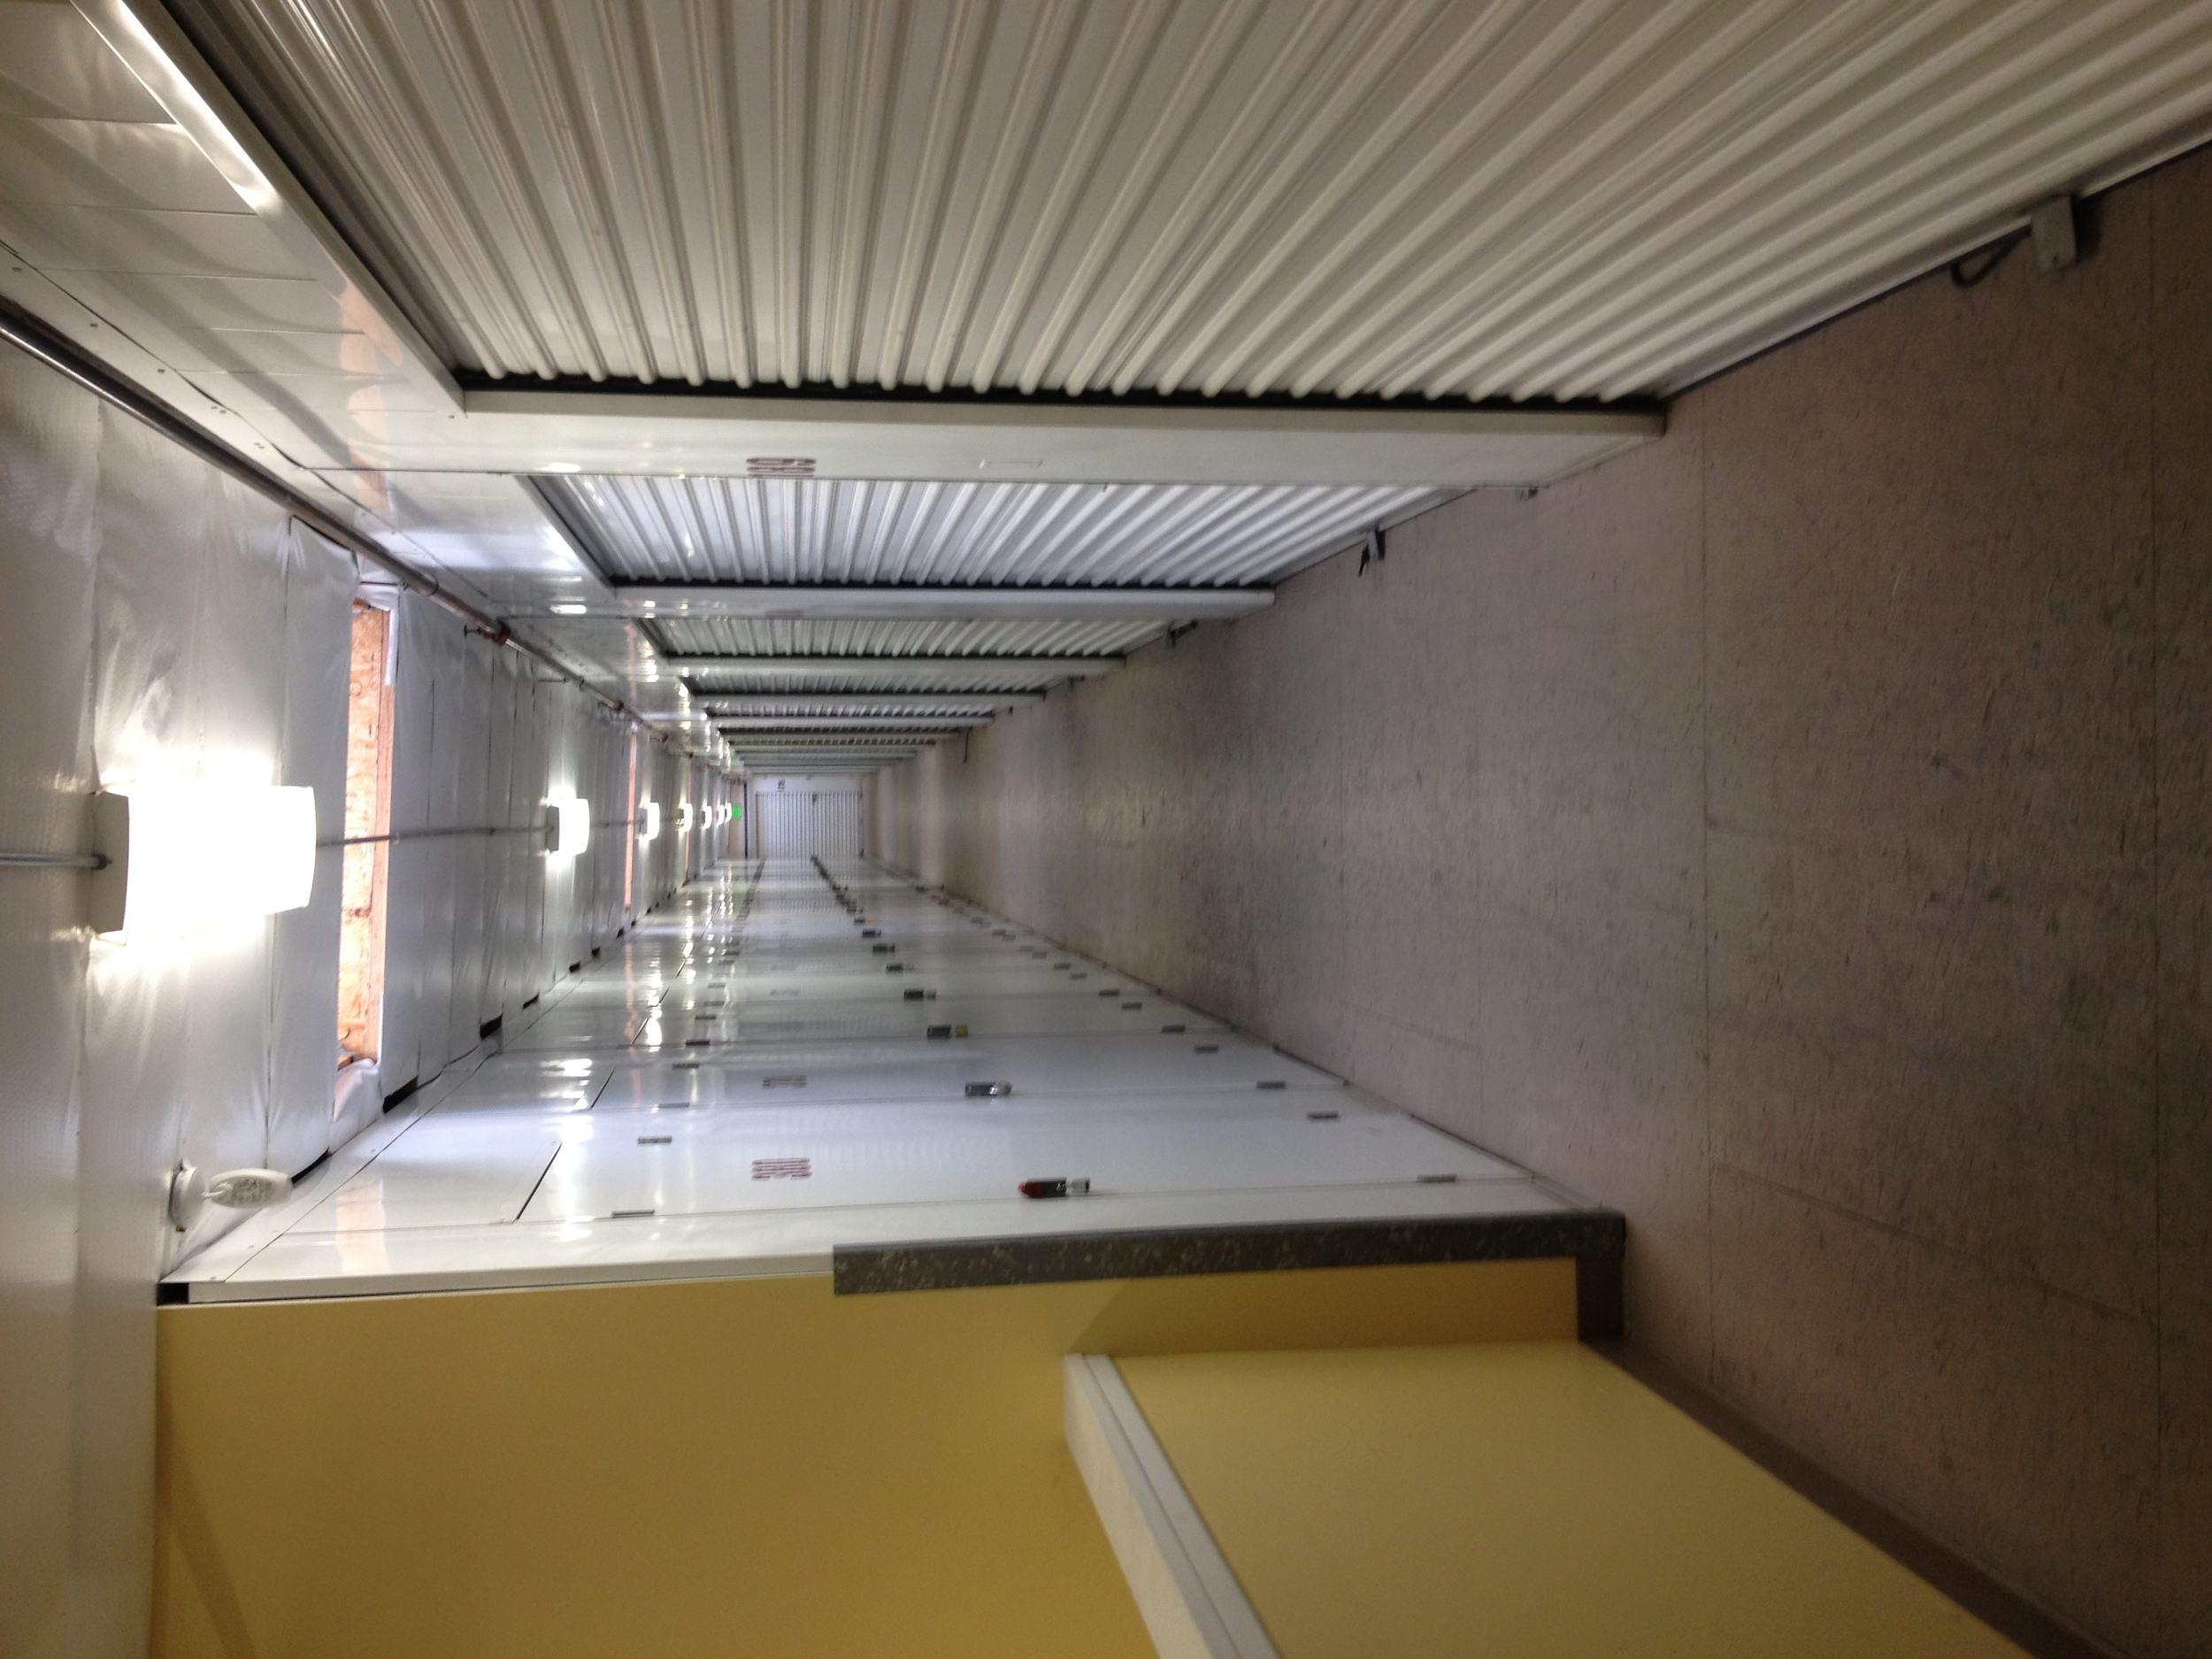 self storage in oxnard california interioir hallway